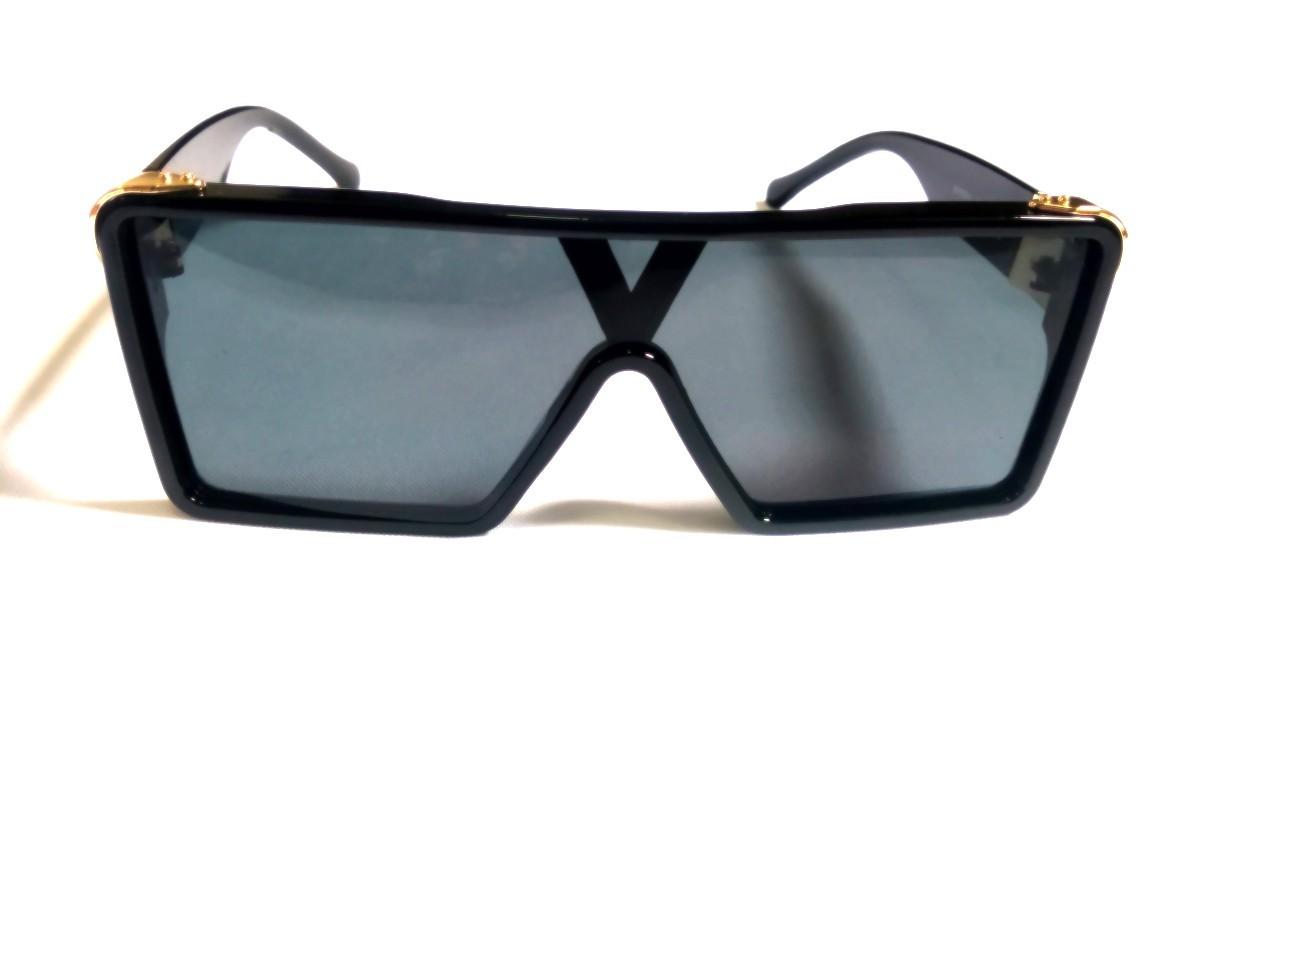 Óculos De Sol Feminino Grande Quadrado Trend-702